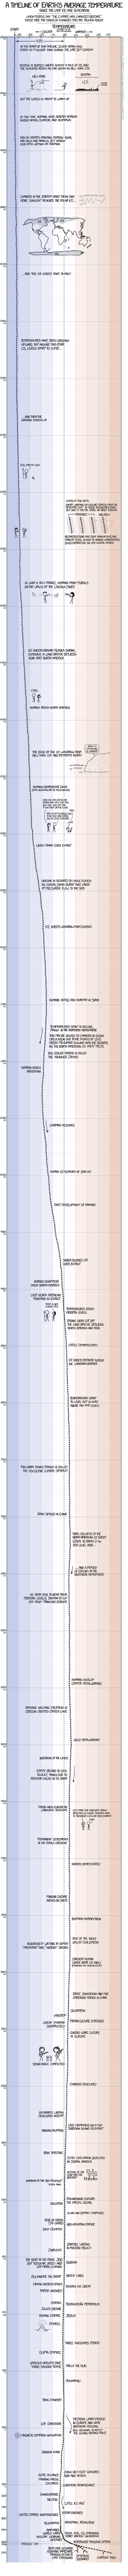 Earth Temperature Timeline